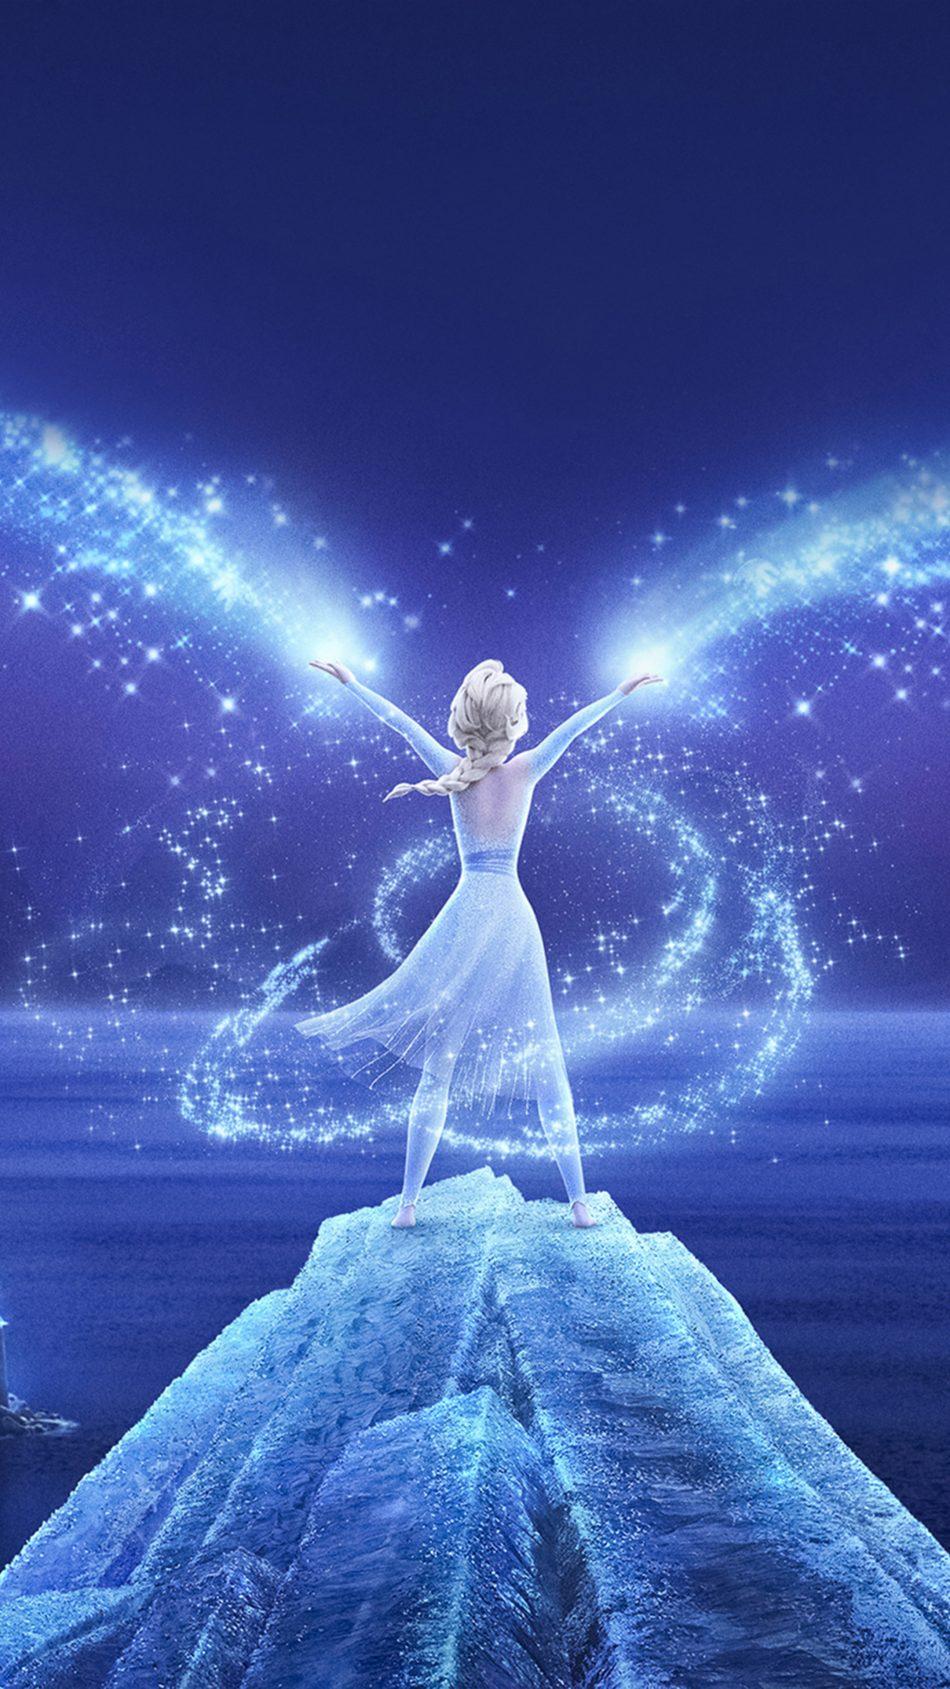 Queen Elsa Frozen 2 2019 4K Ultra HD Mobile Wallpaper